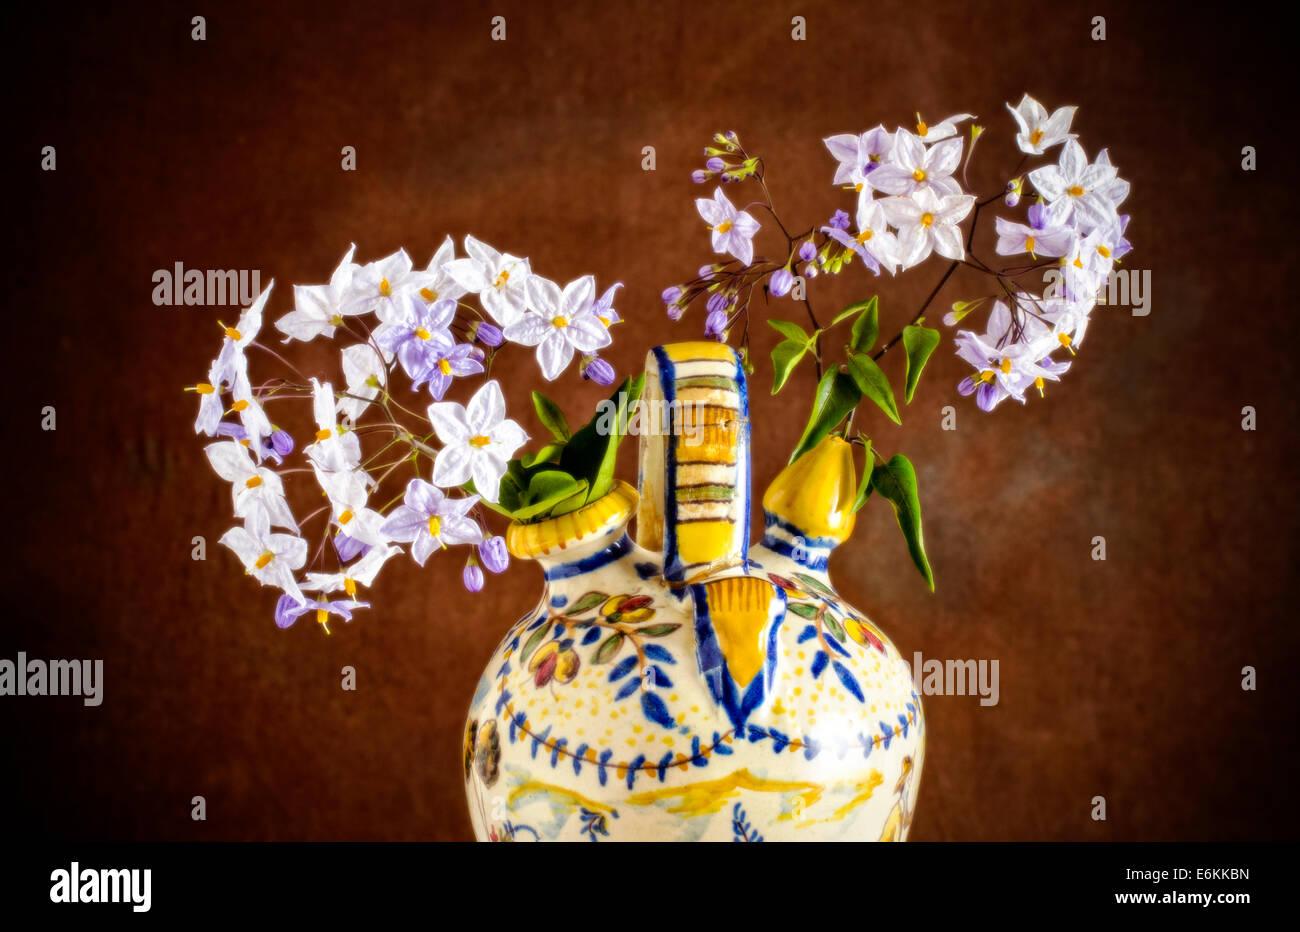 Sprigs of flowering potato Jasmine in an old Spanish wine jar - Stock Image